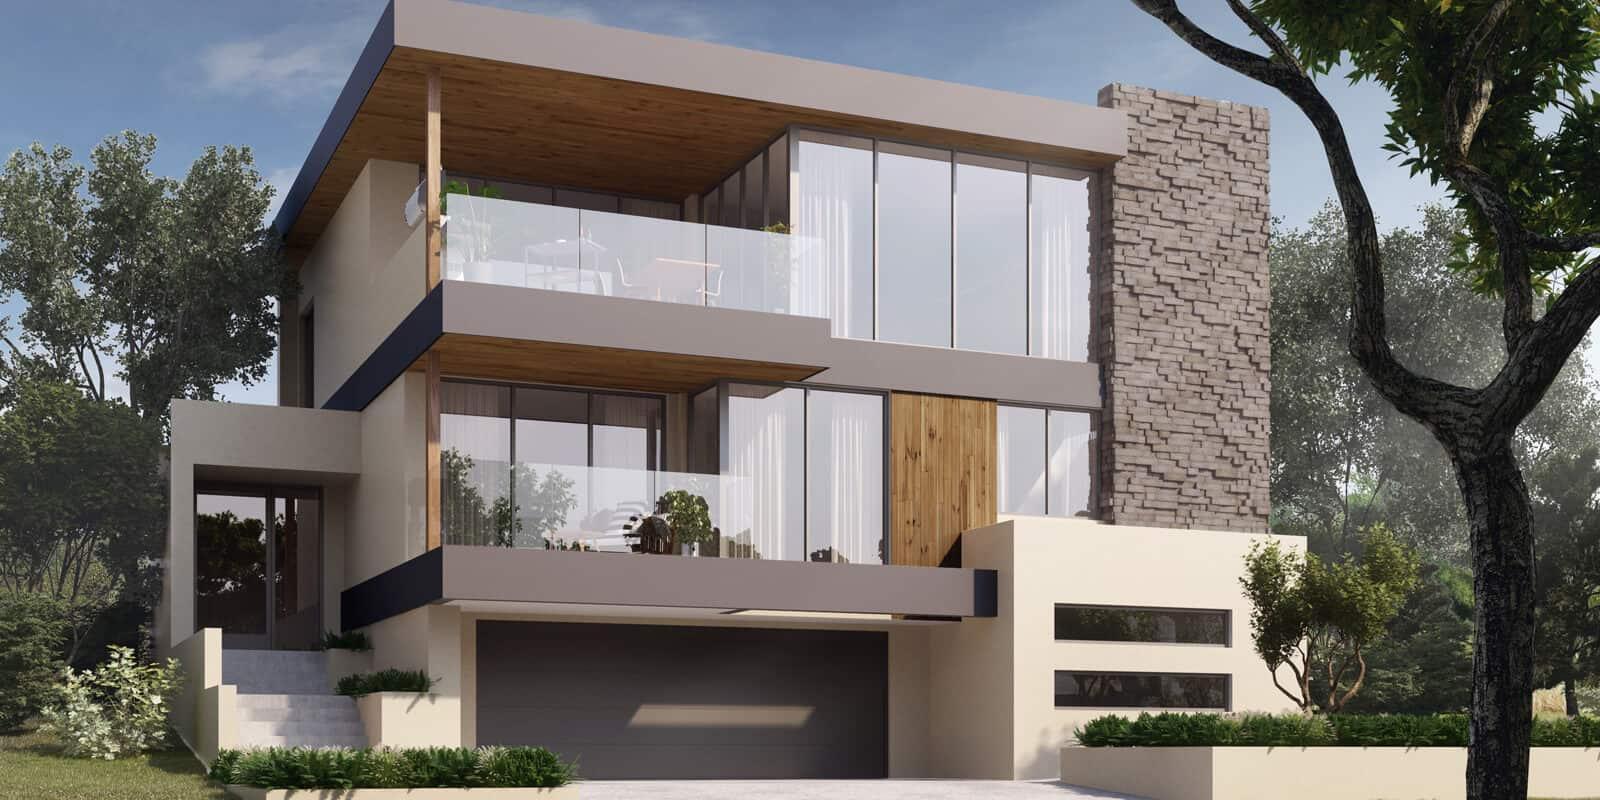 Luxury custom home in Woodlands